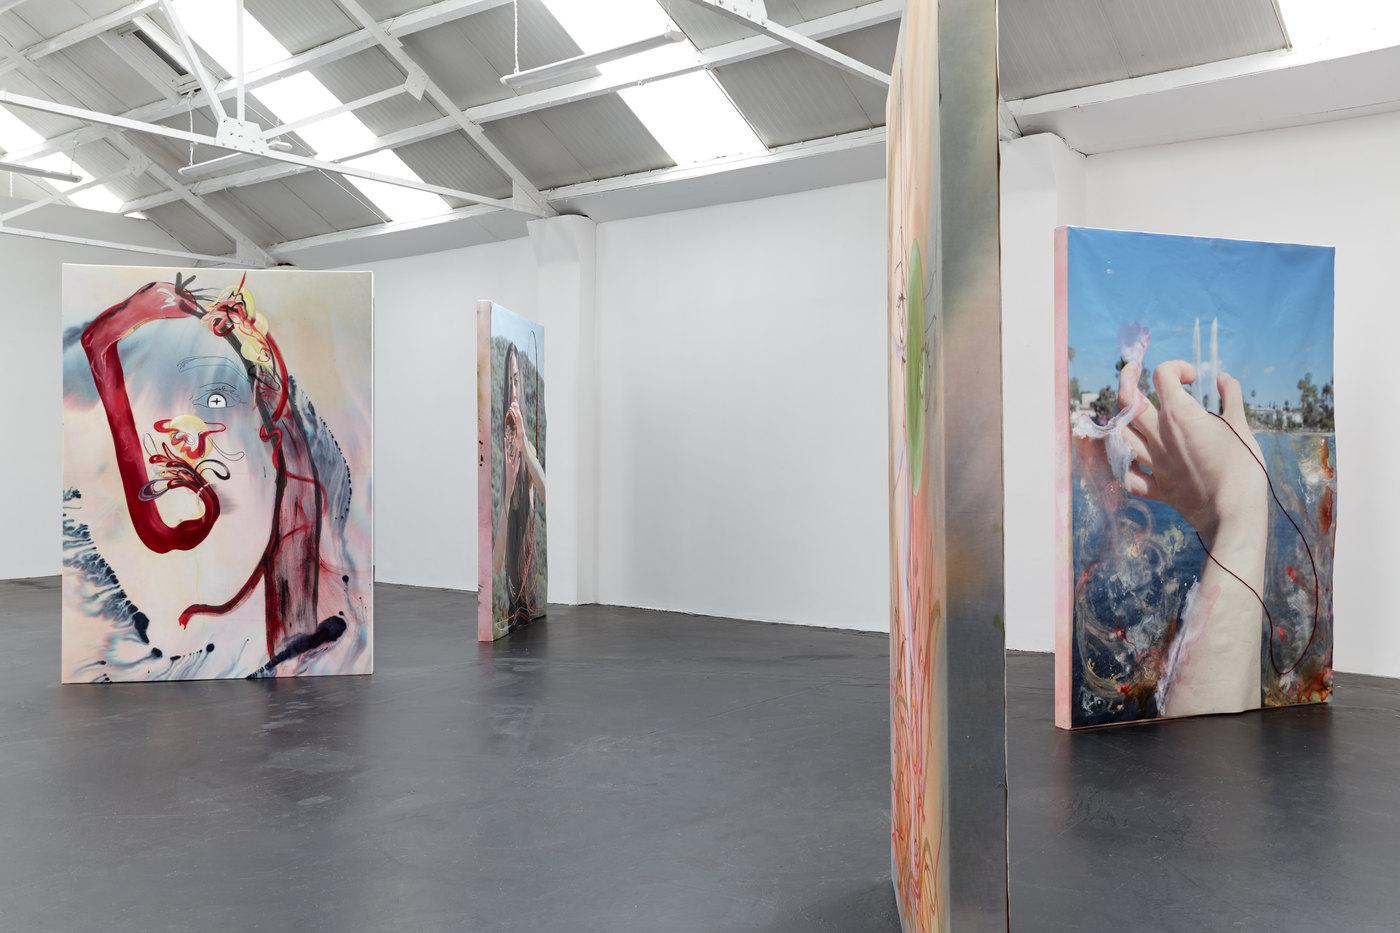 08. Nora Berman - Charm - Installation View VIII